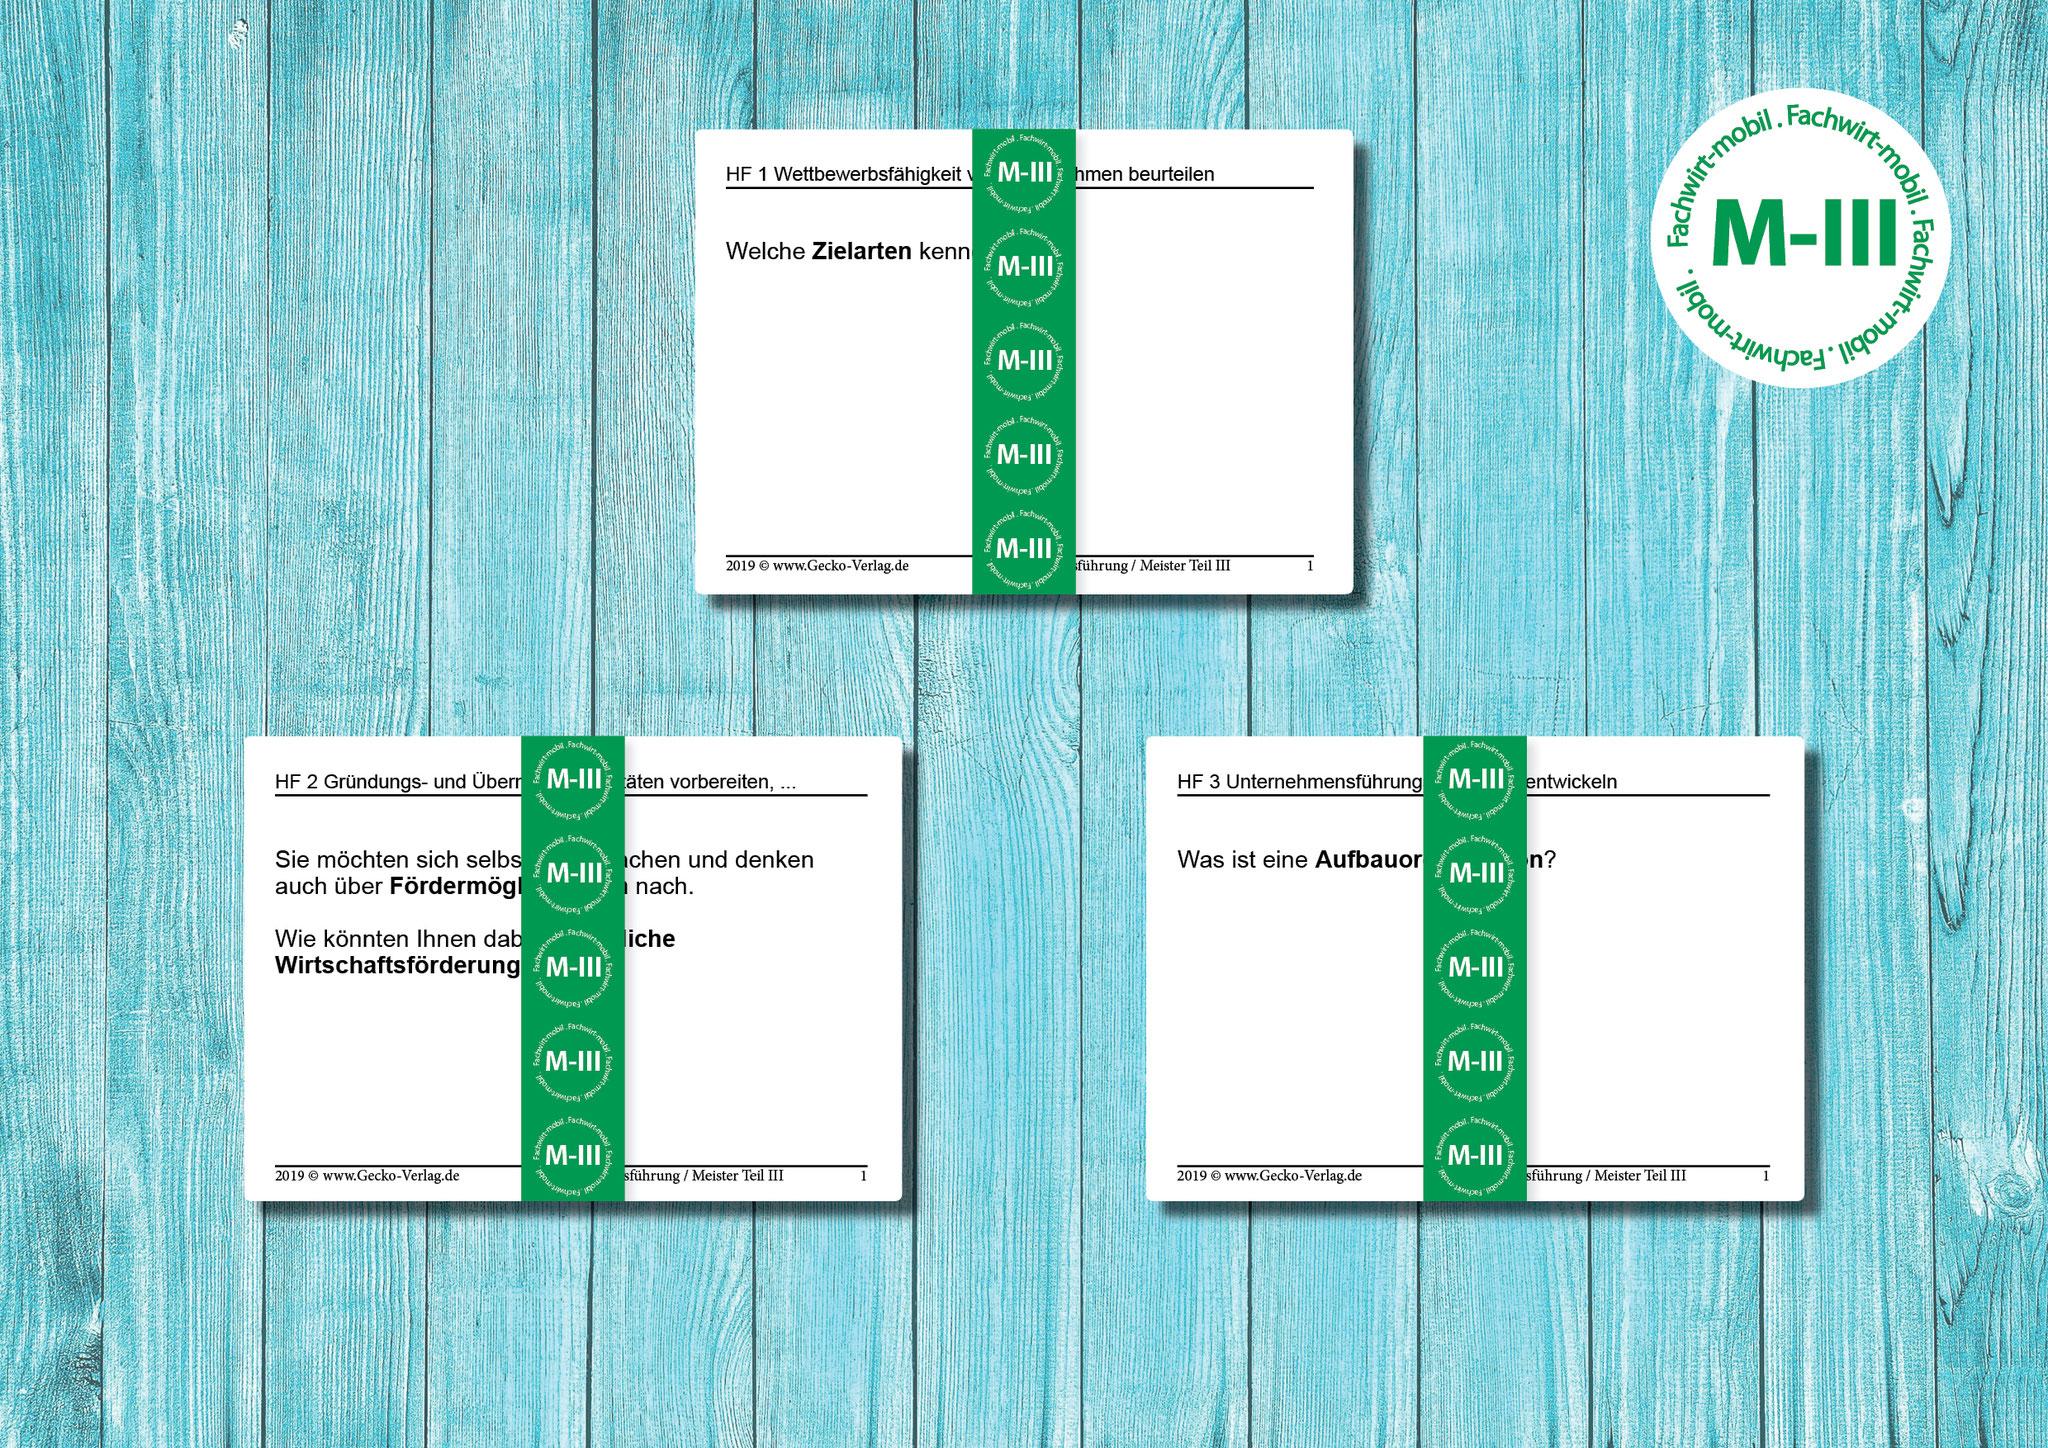 Ihre Lernkarten (gedruckt, geschnitten, sortiert)   Image: Pixabay